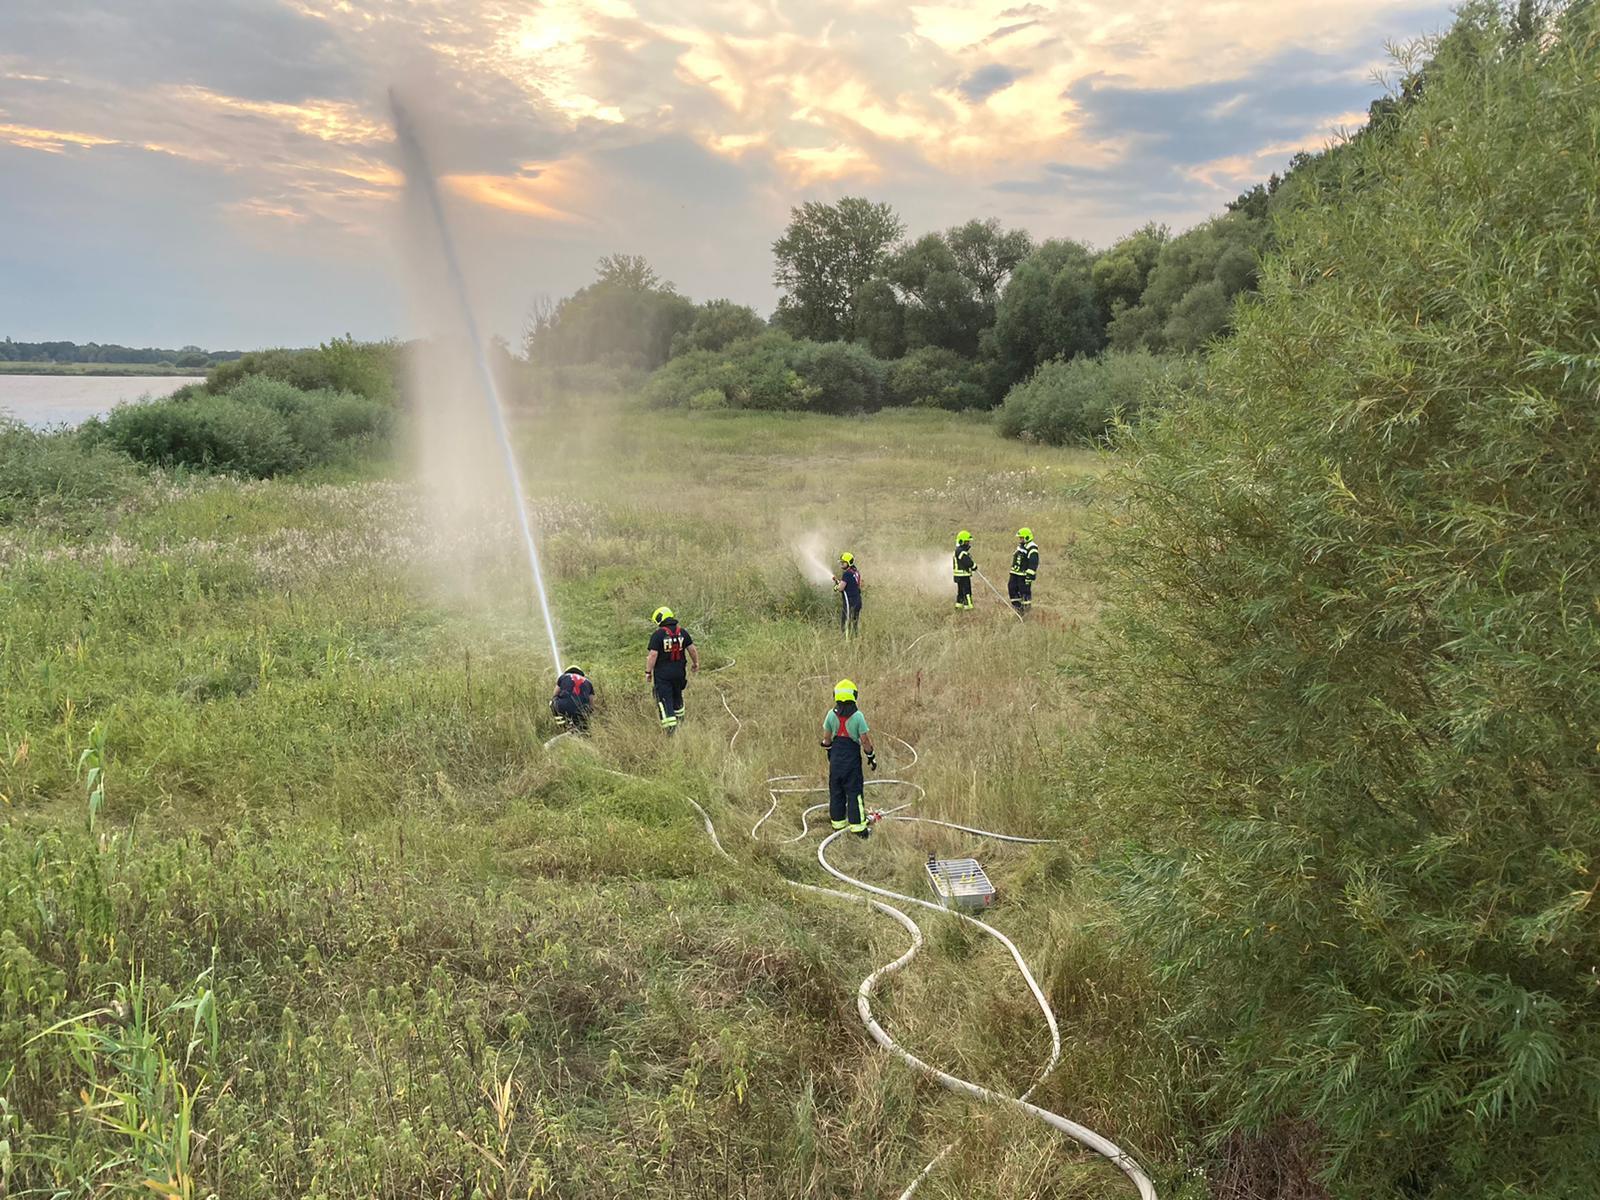 2020-08-18 Übung Wegetationsbrand/Wasserförderung 3